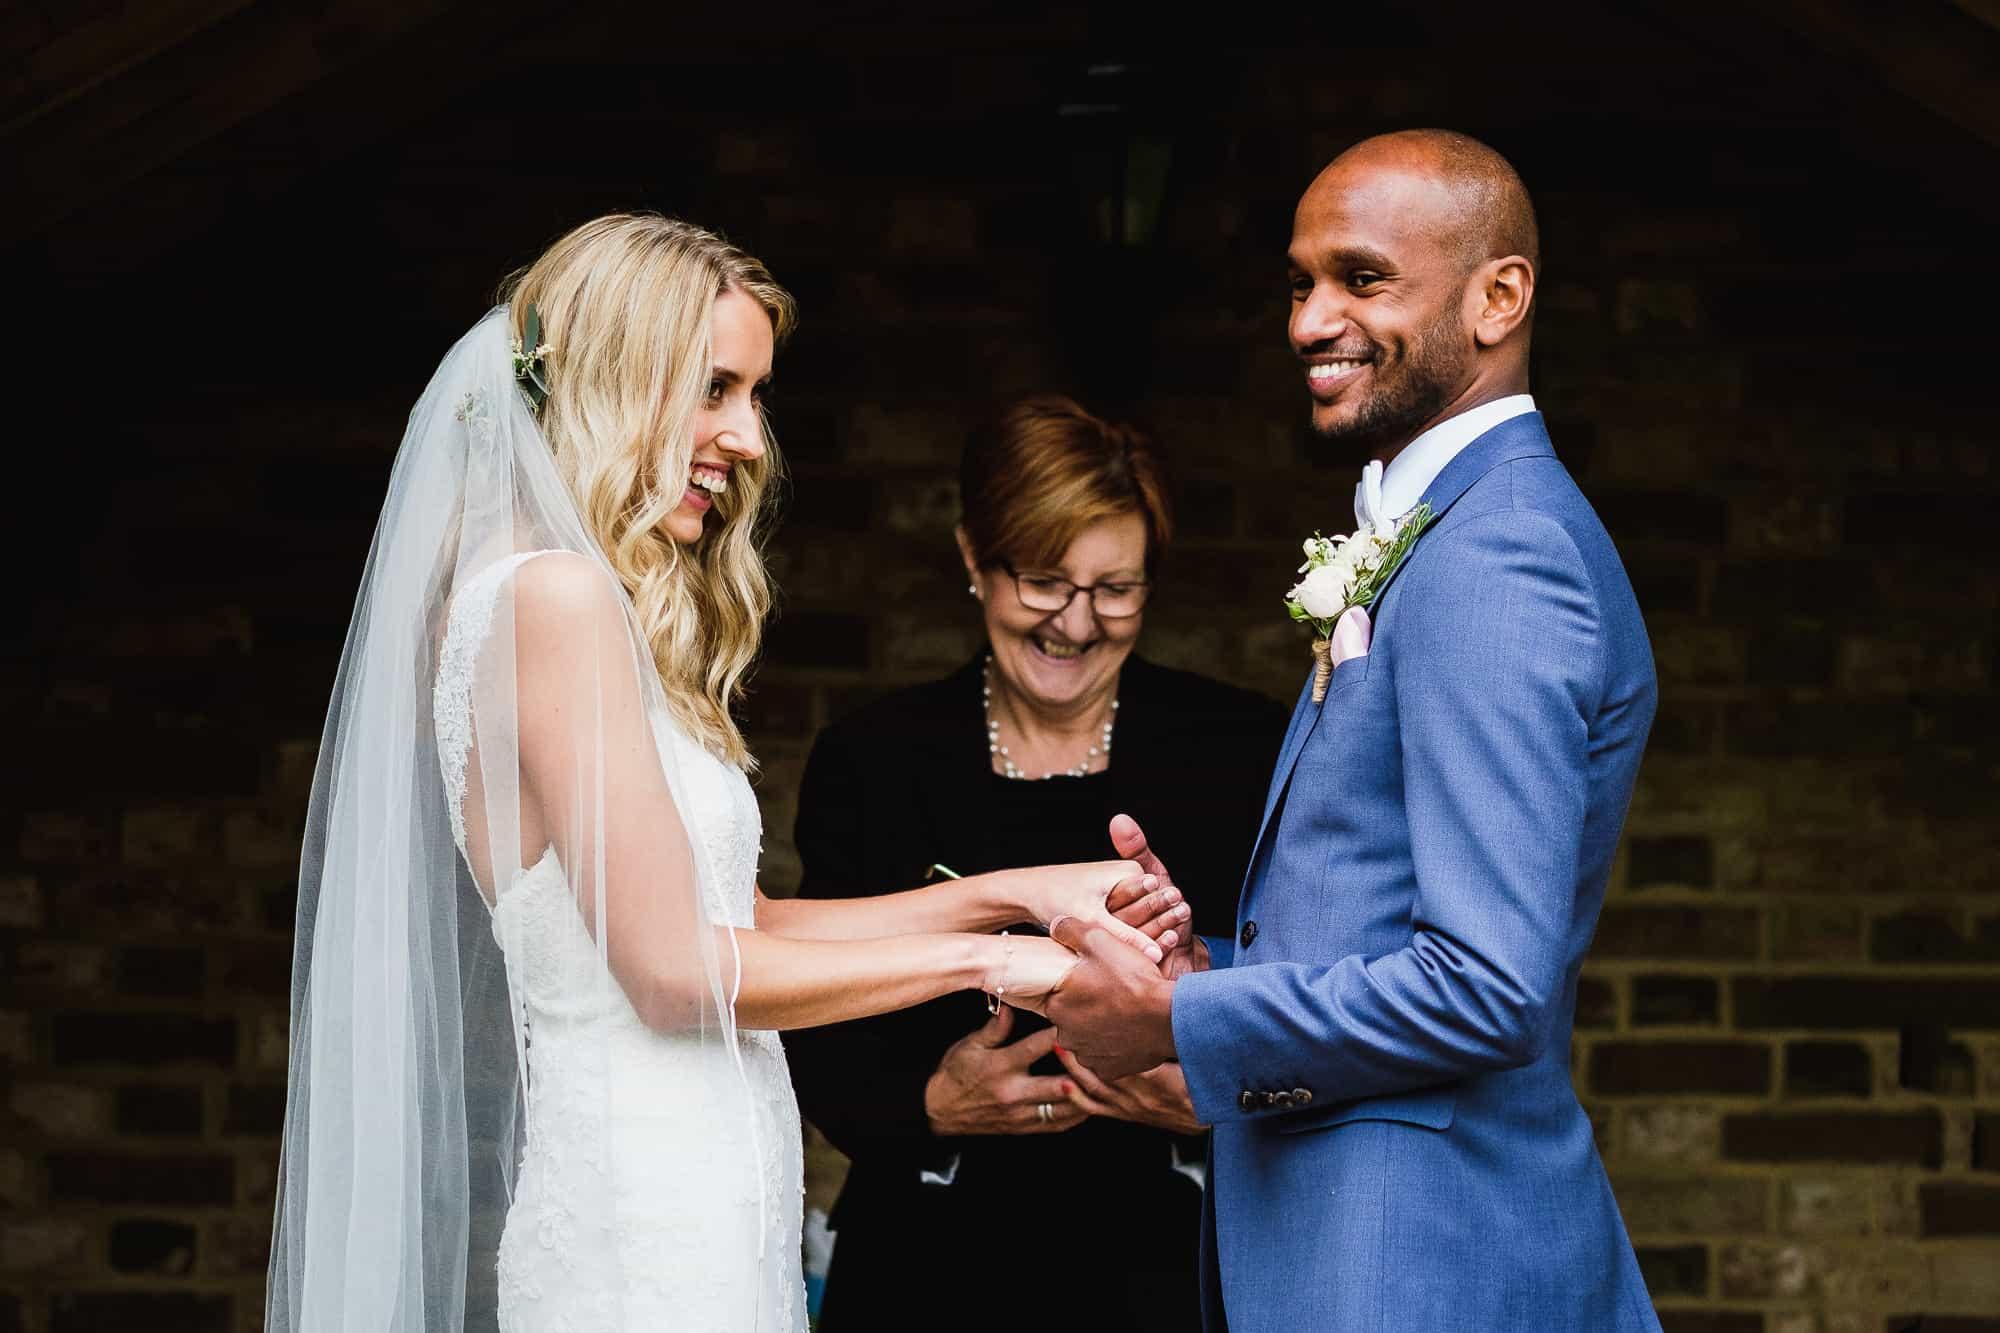 marleybrook-house-wedding-photography-matt-tyler-0027